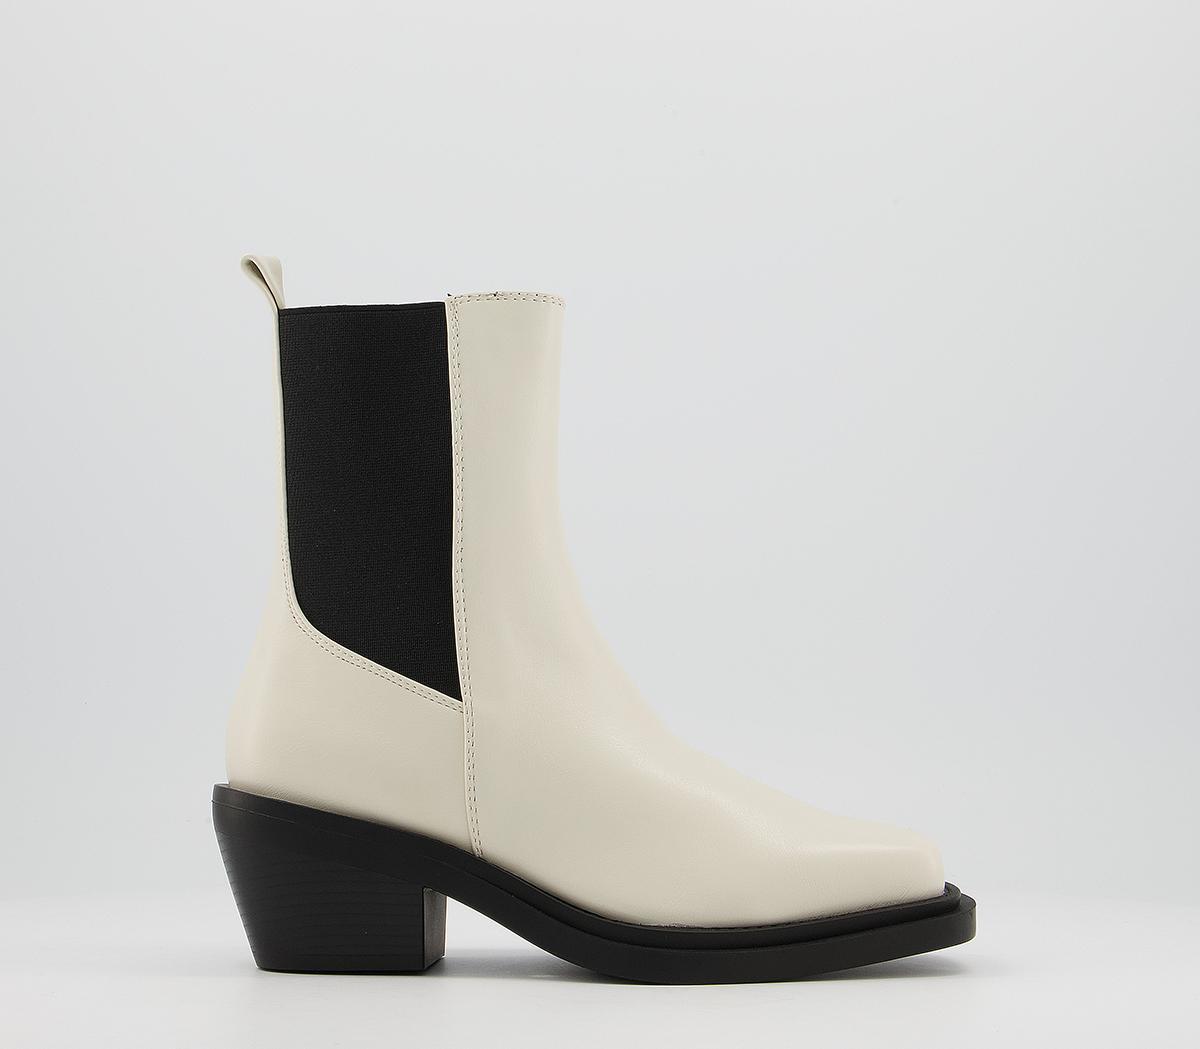 Odette Boots